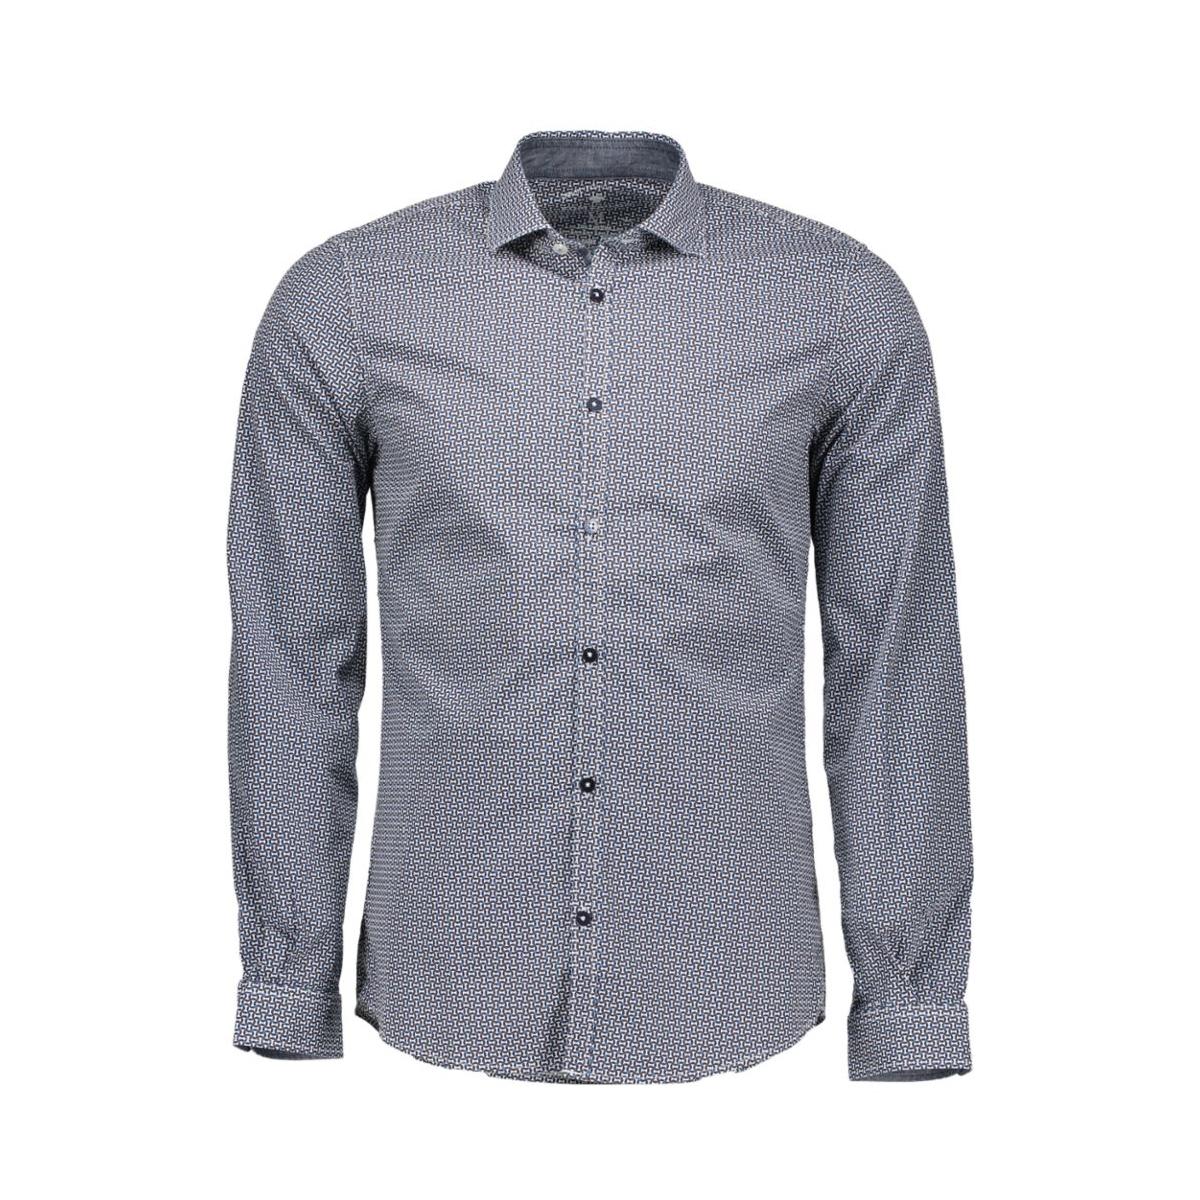 2032268.01.10 tom tailor overhemd 1000